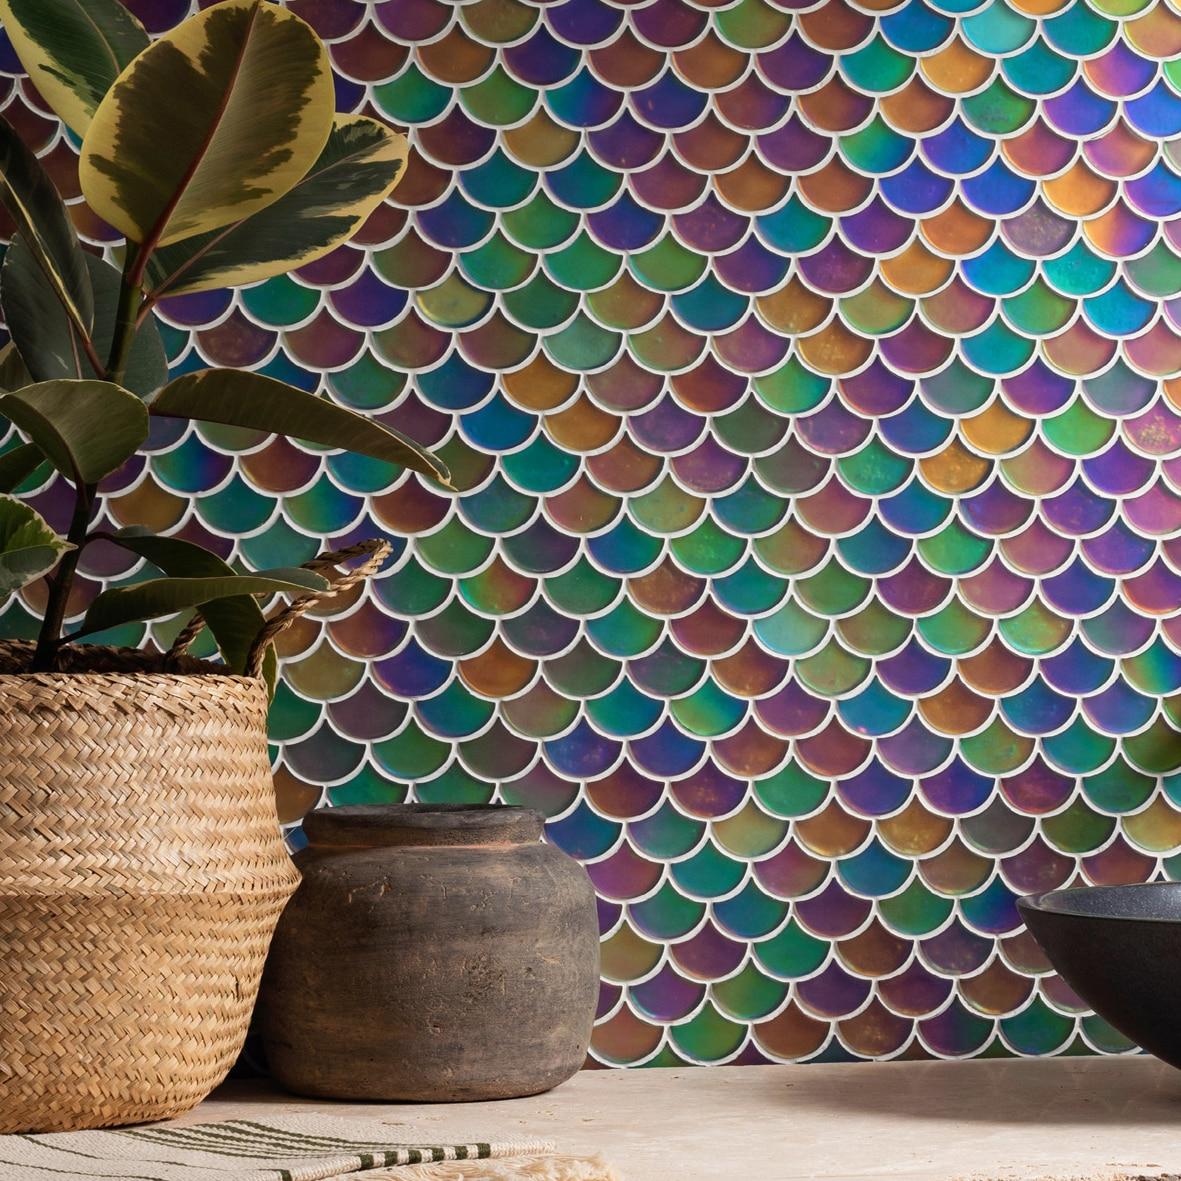 Original Style Aqua scale mosaics